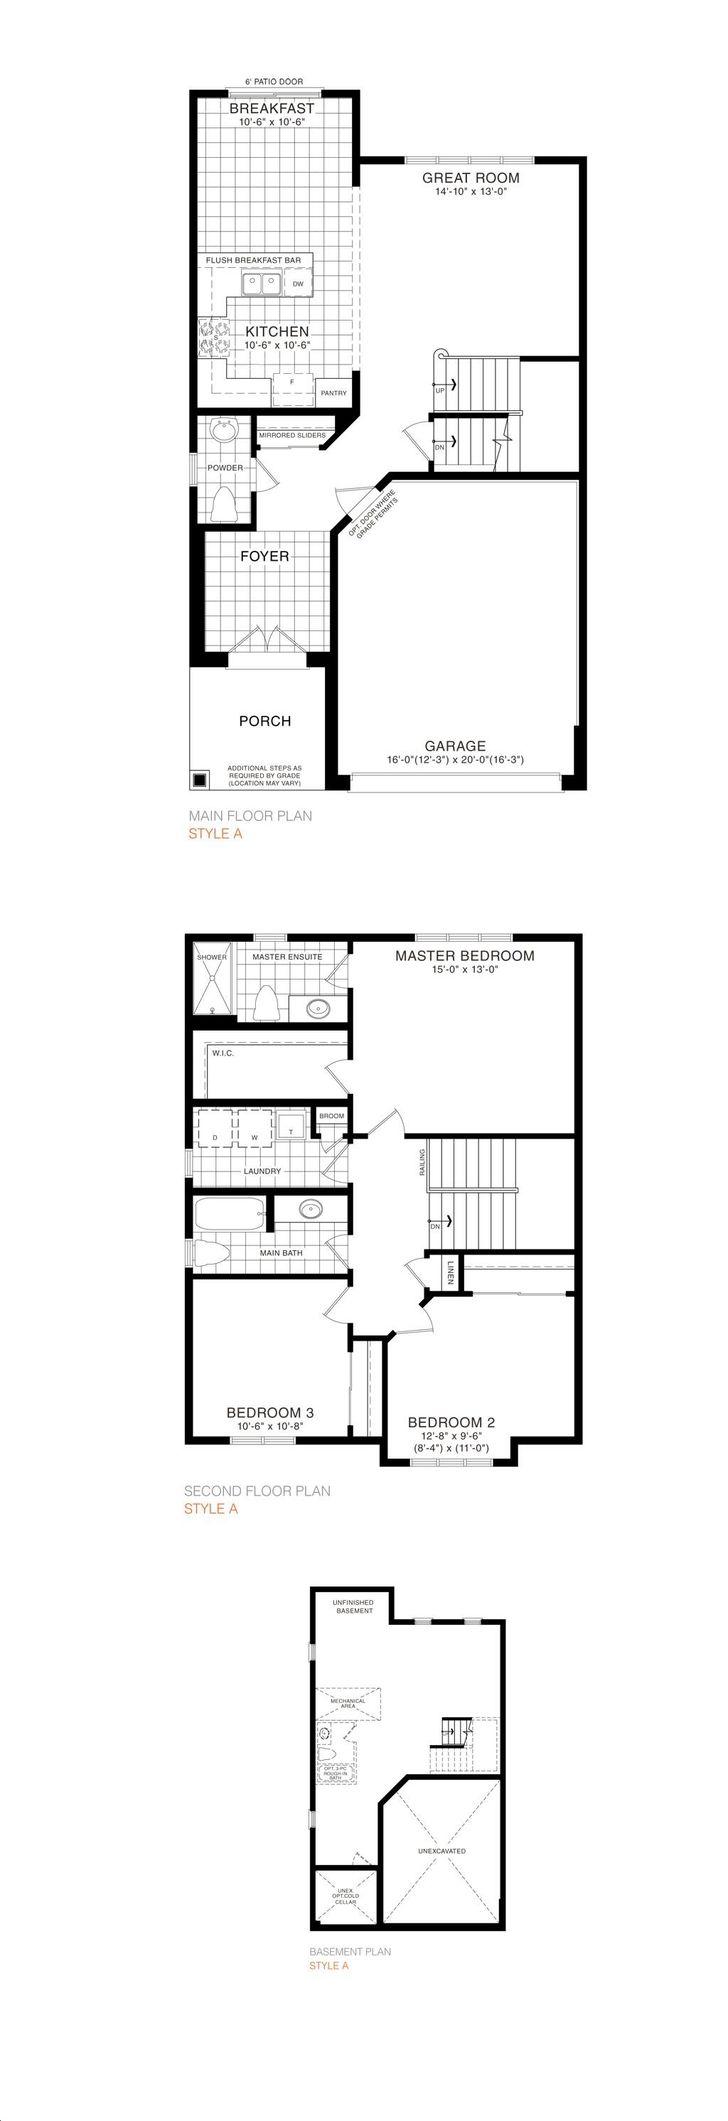 Empire Avalon By Empire Maple 33 Detached Floorplan 3 Bed 2 5 Bath